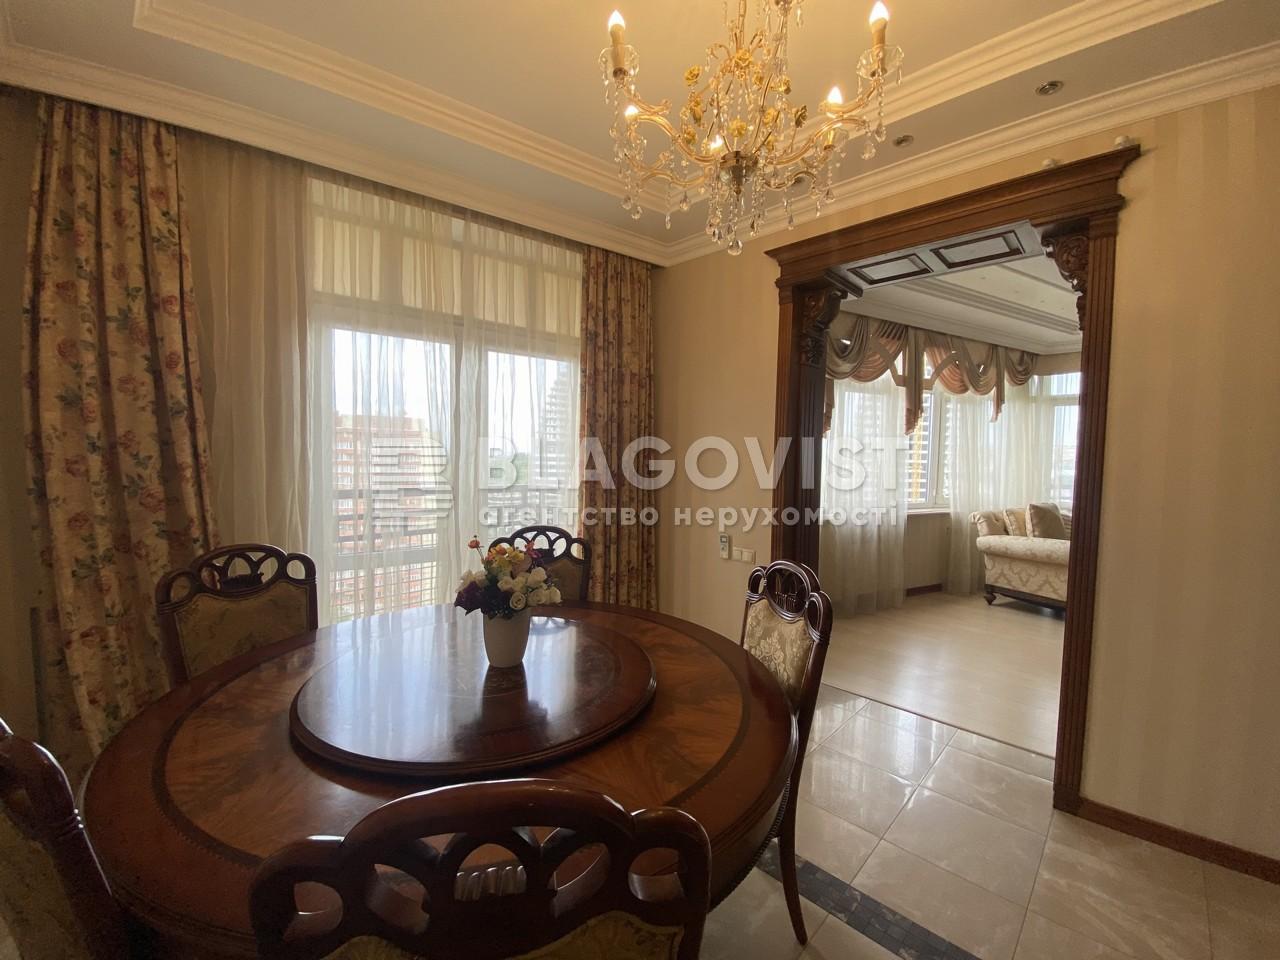 Квартира R-39283, Старонаводницкая, 6б, Киев - Фото 9